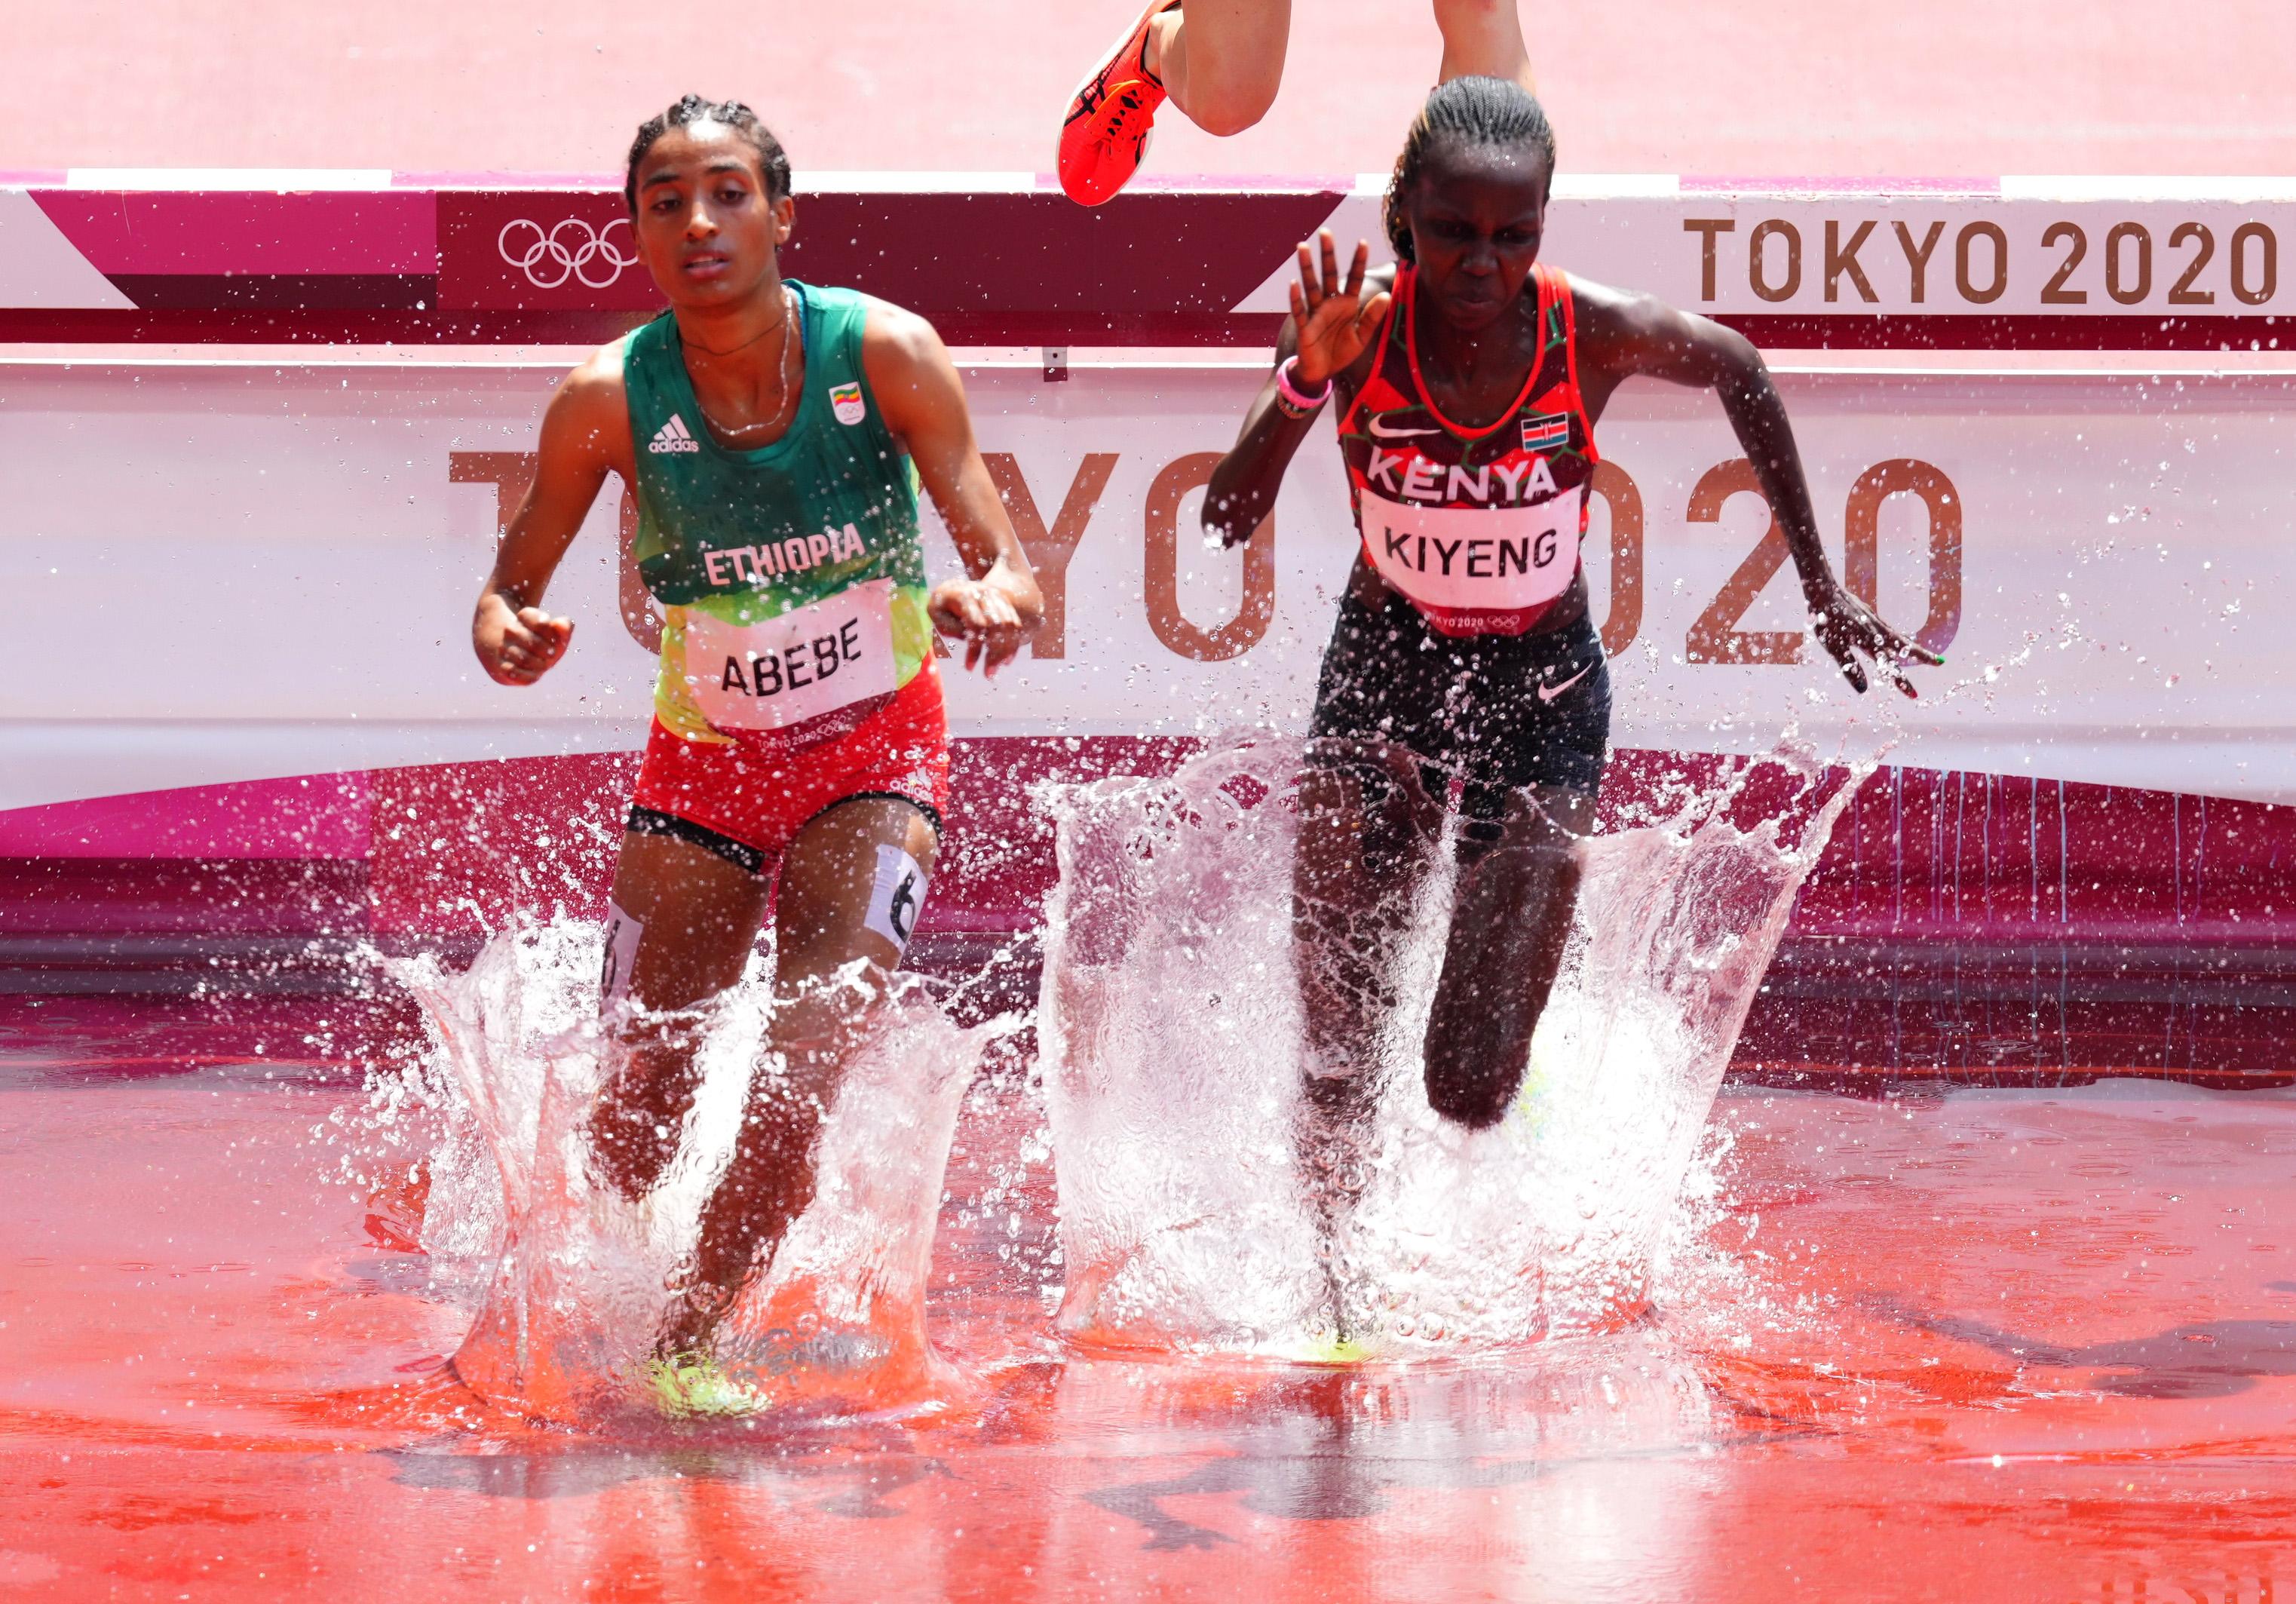 Tokyo 2020 Olympics - Athletics - Women's 3000m Steeplechase - Round 1 - OLS - Olympic Stadium, Tokyo, Japan – August 1, 2021. Hyvin Kiyeng of Kenya and Mekides Abebe of Ethiopia in action REUTERS/Aleksandra Szmigiel